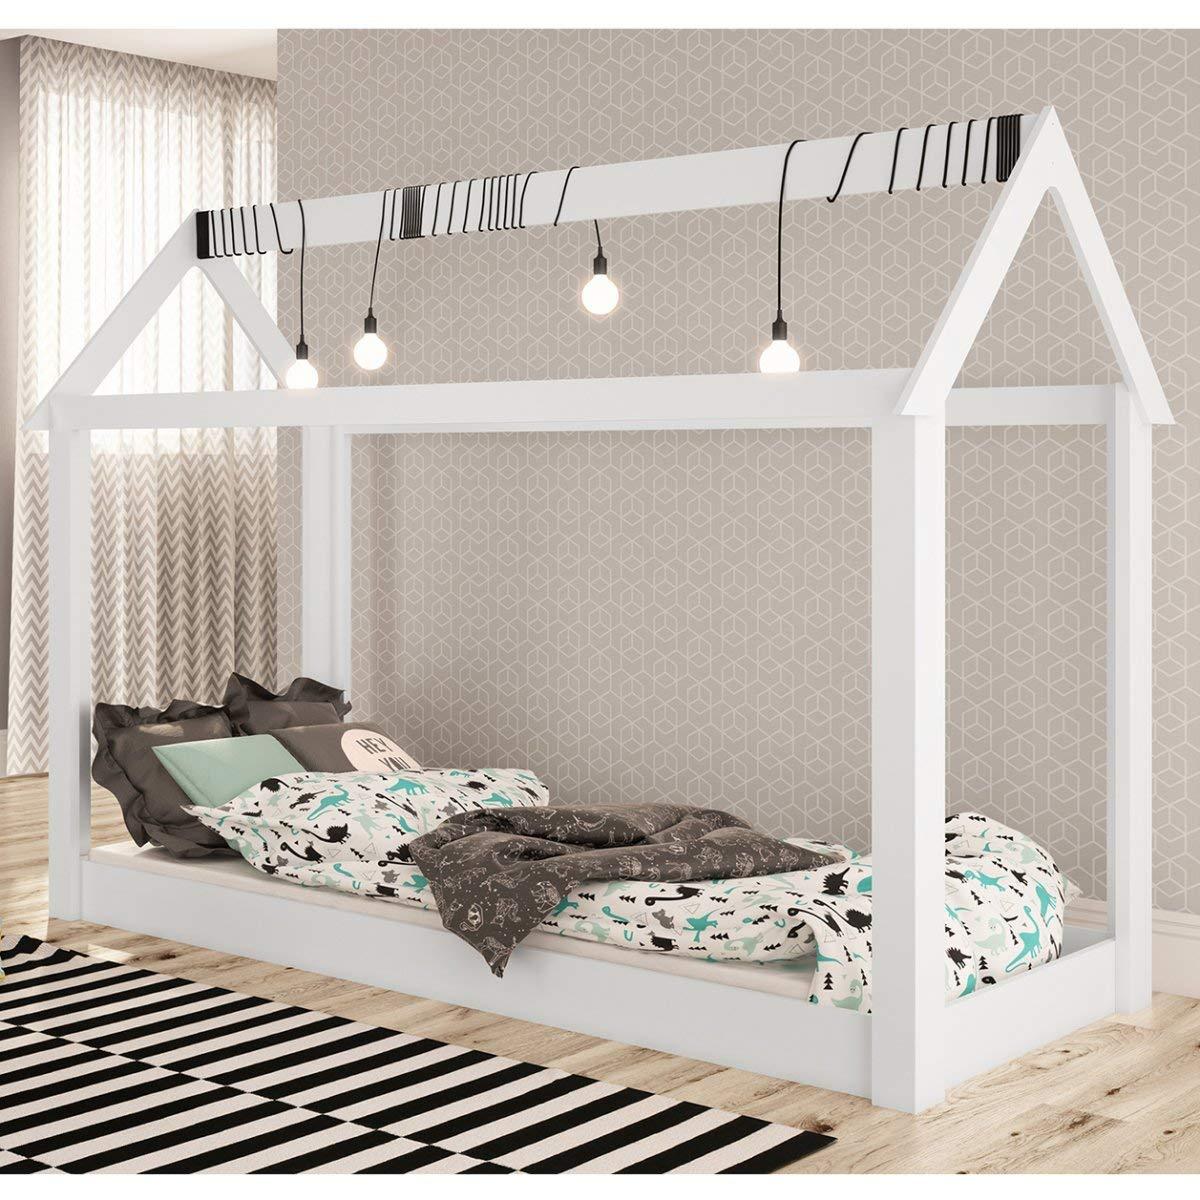 cama montessori branca formato casinha